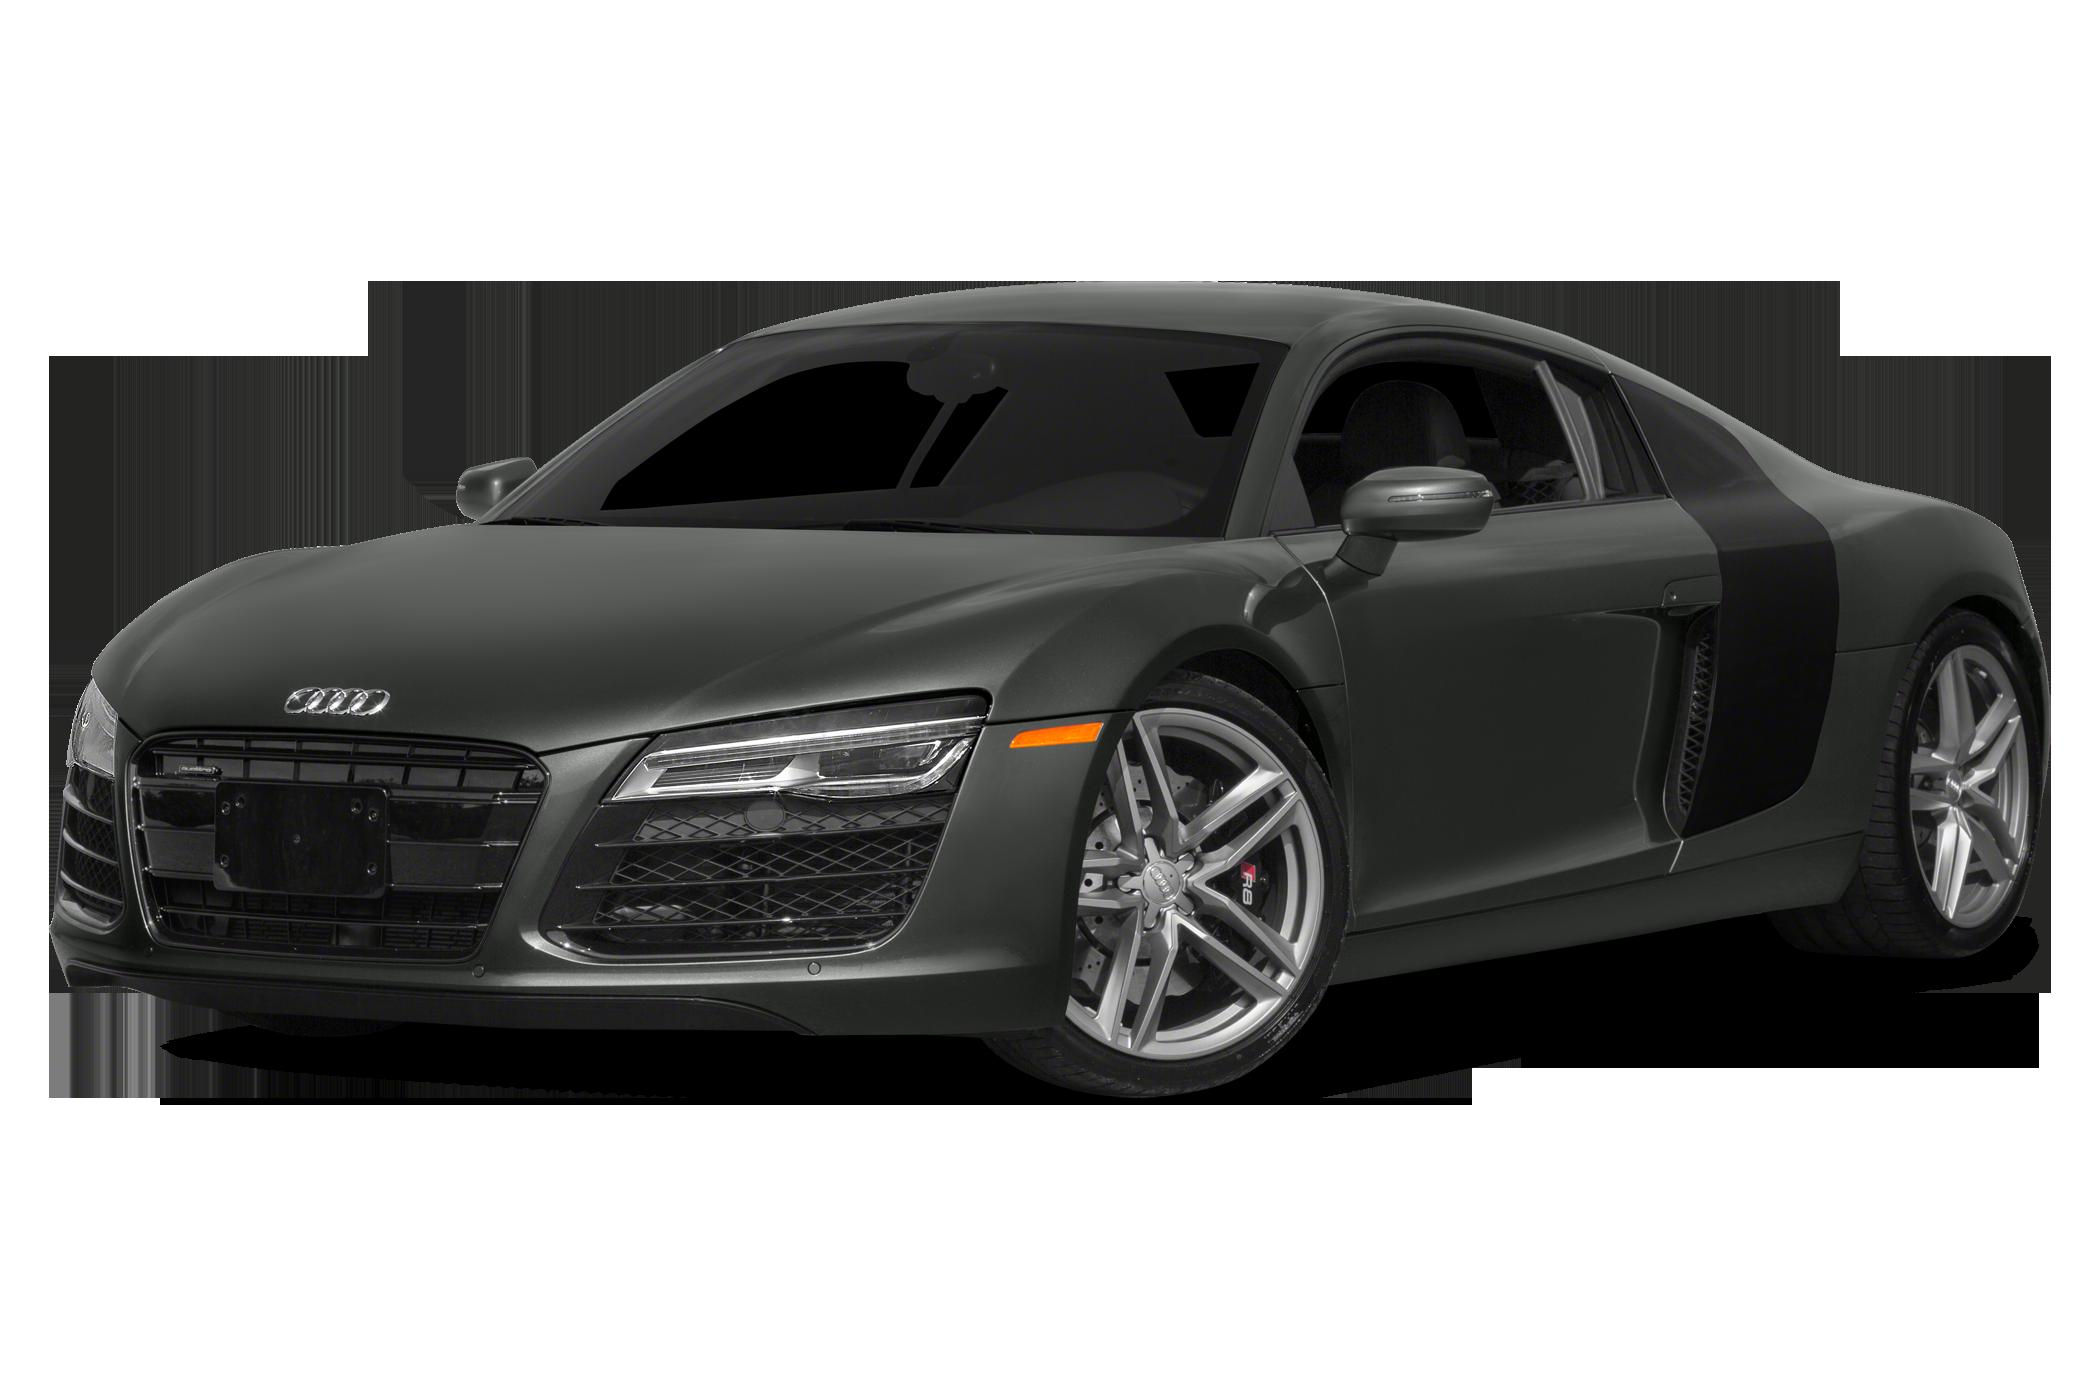 Audi R8 2015 Concept